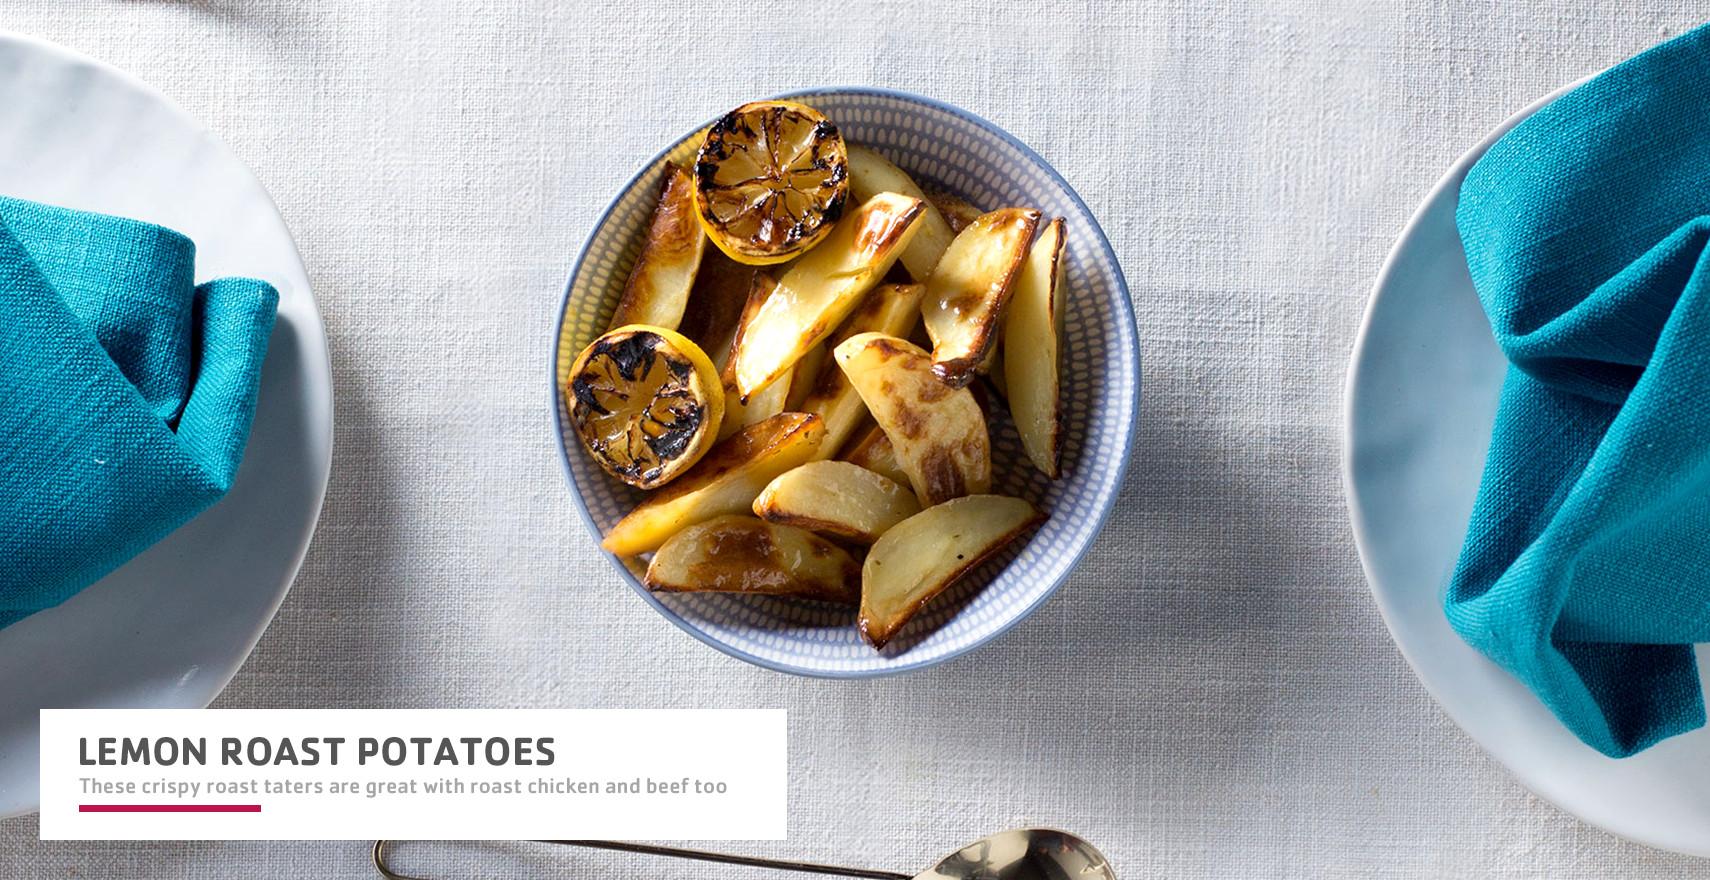 Lemon roast potatoes header image.jpg